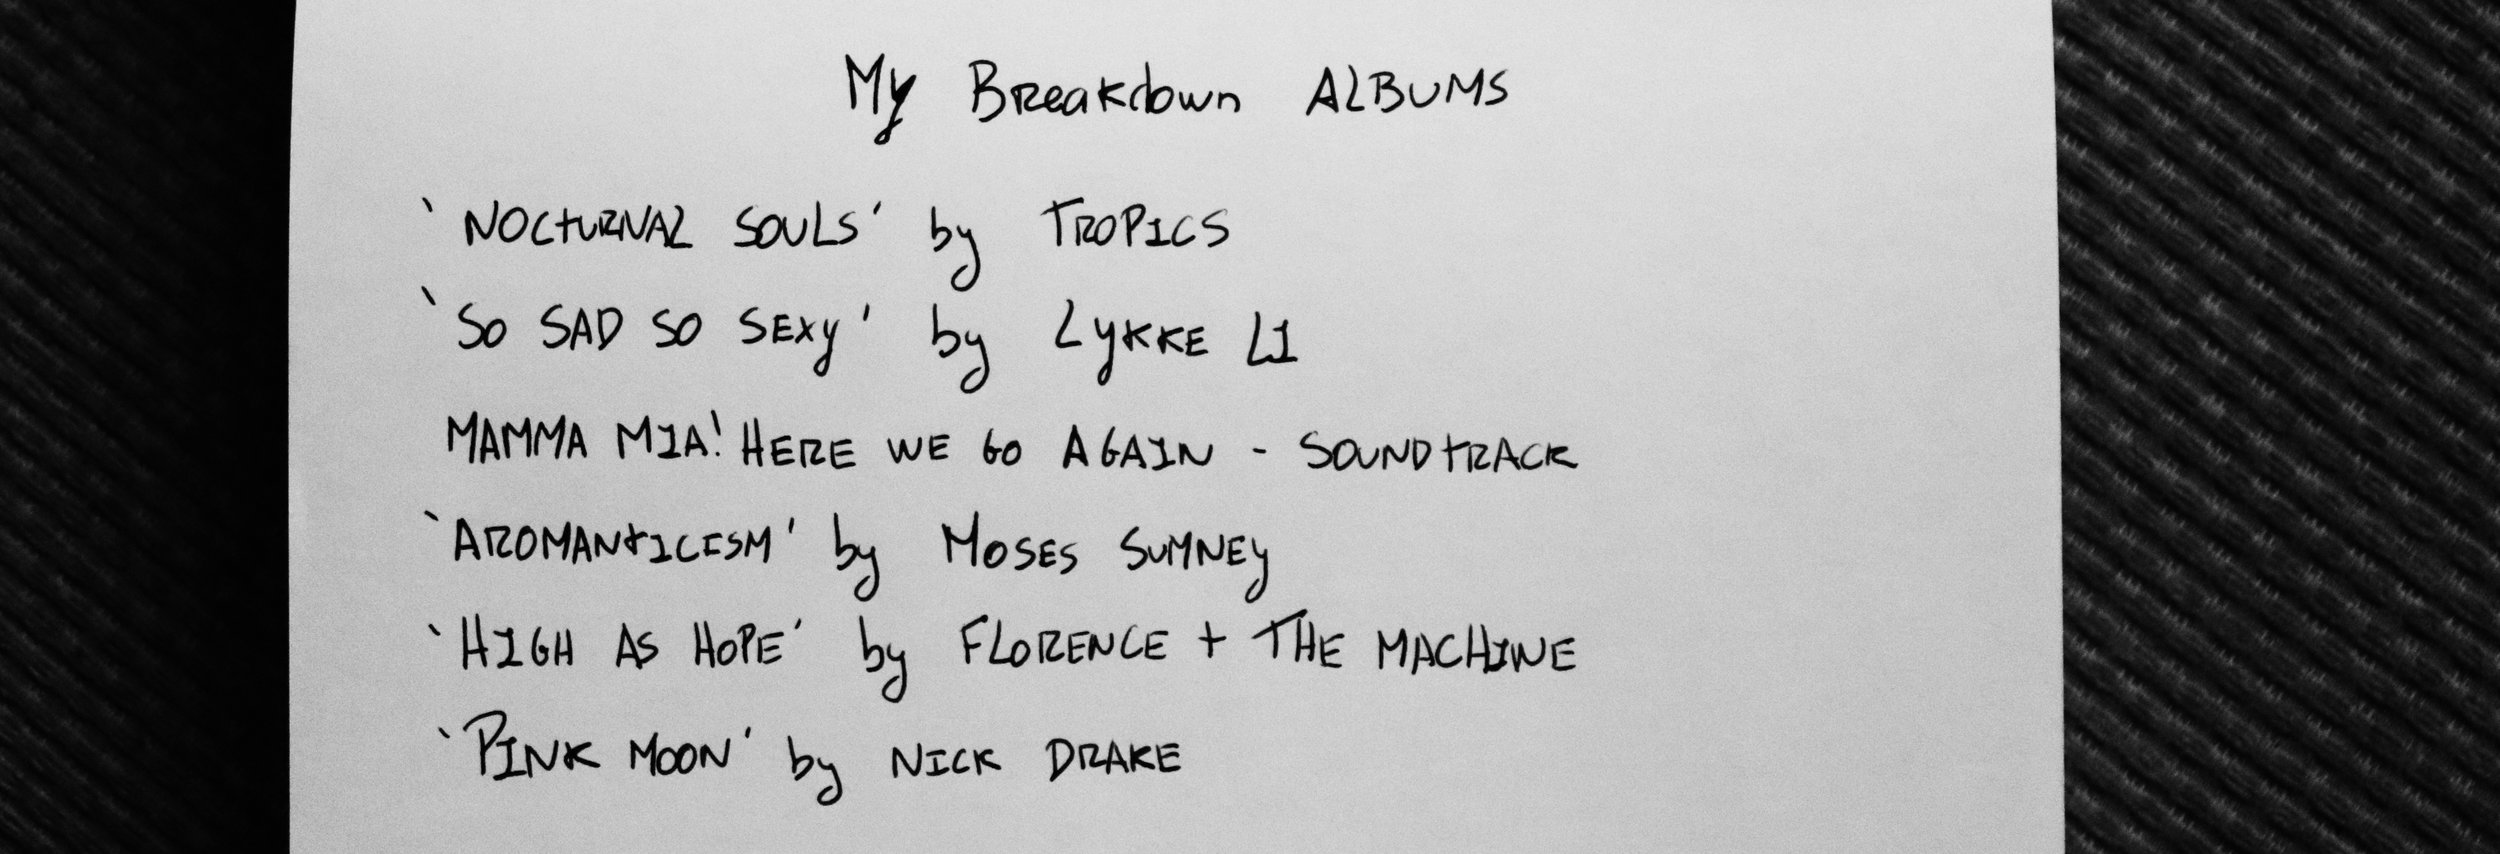 albumstest.jpg